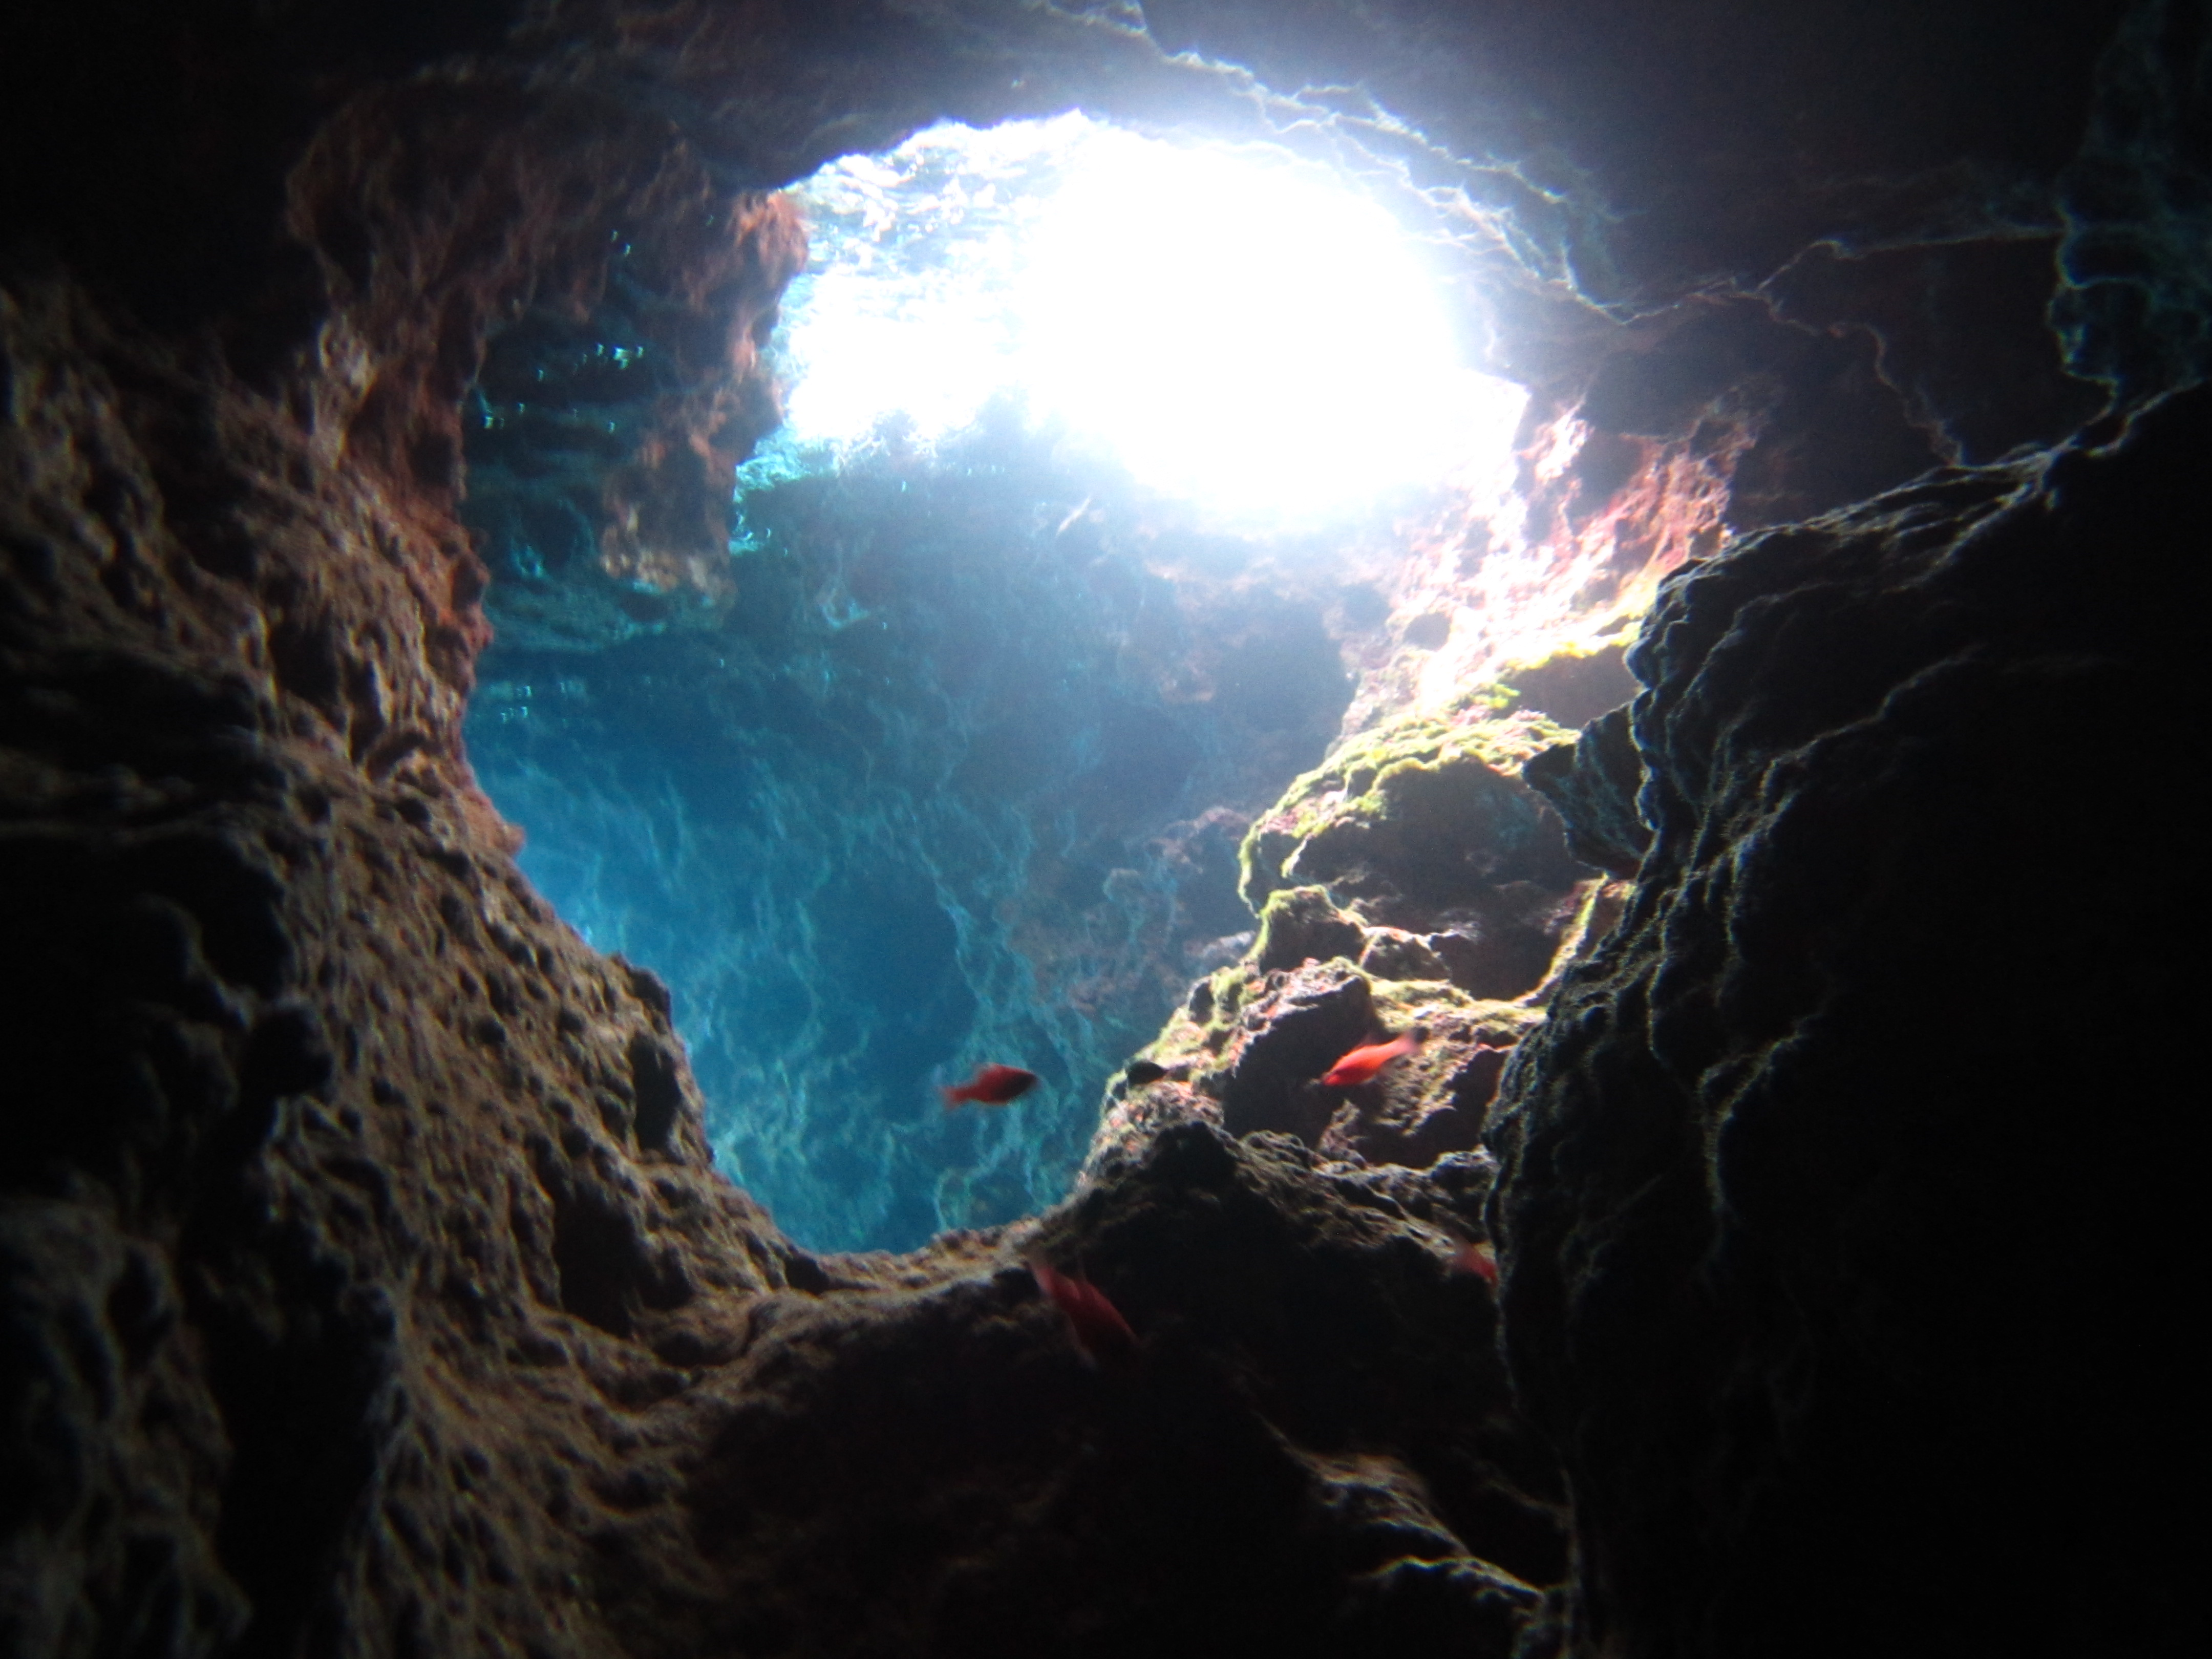 Cueva Blanca